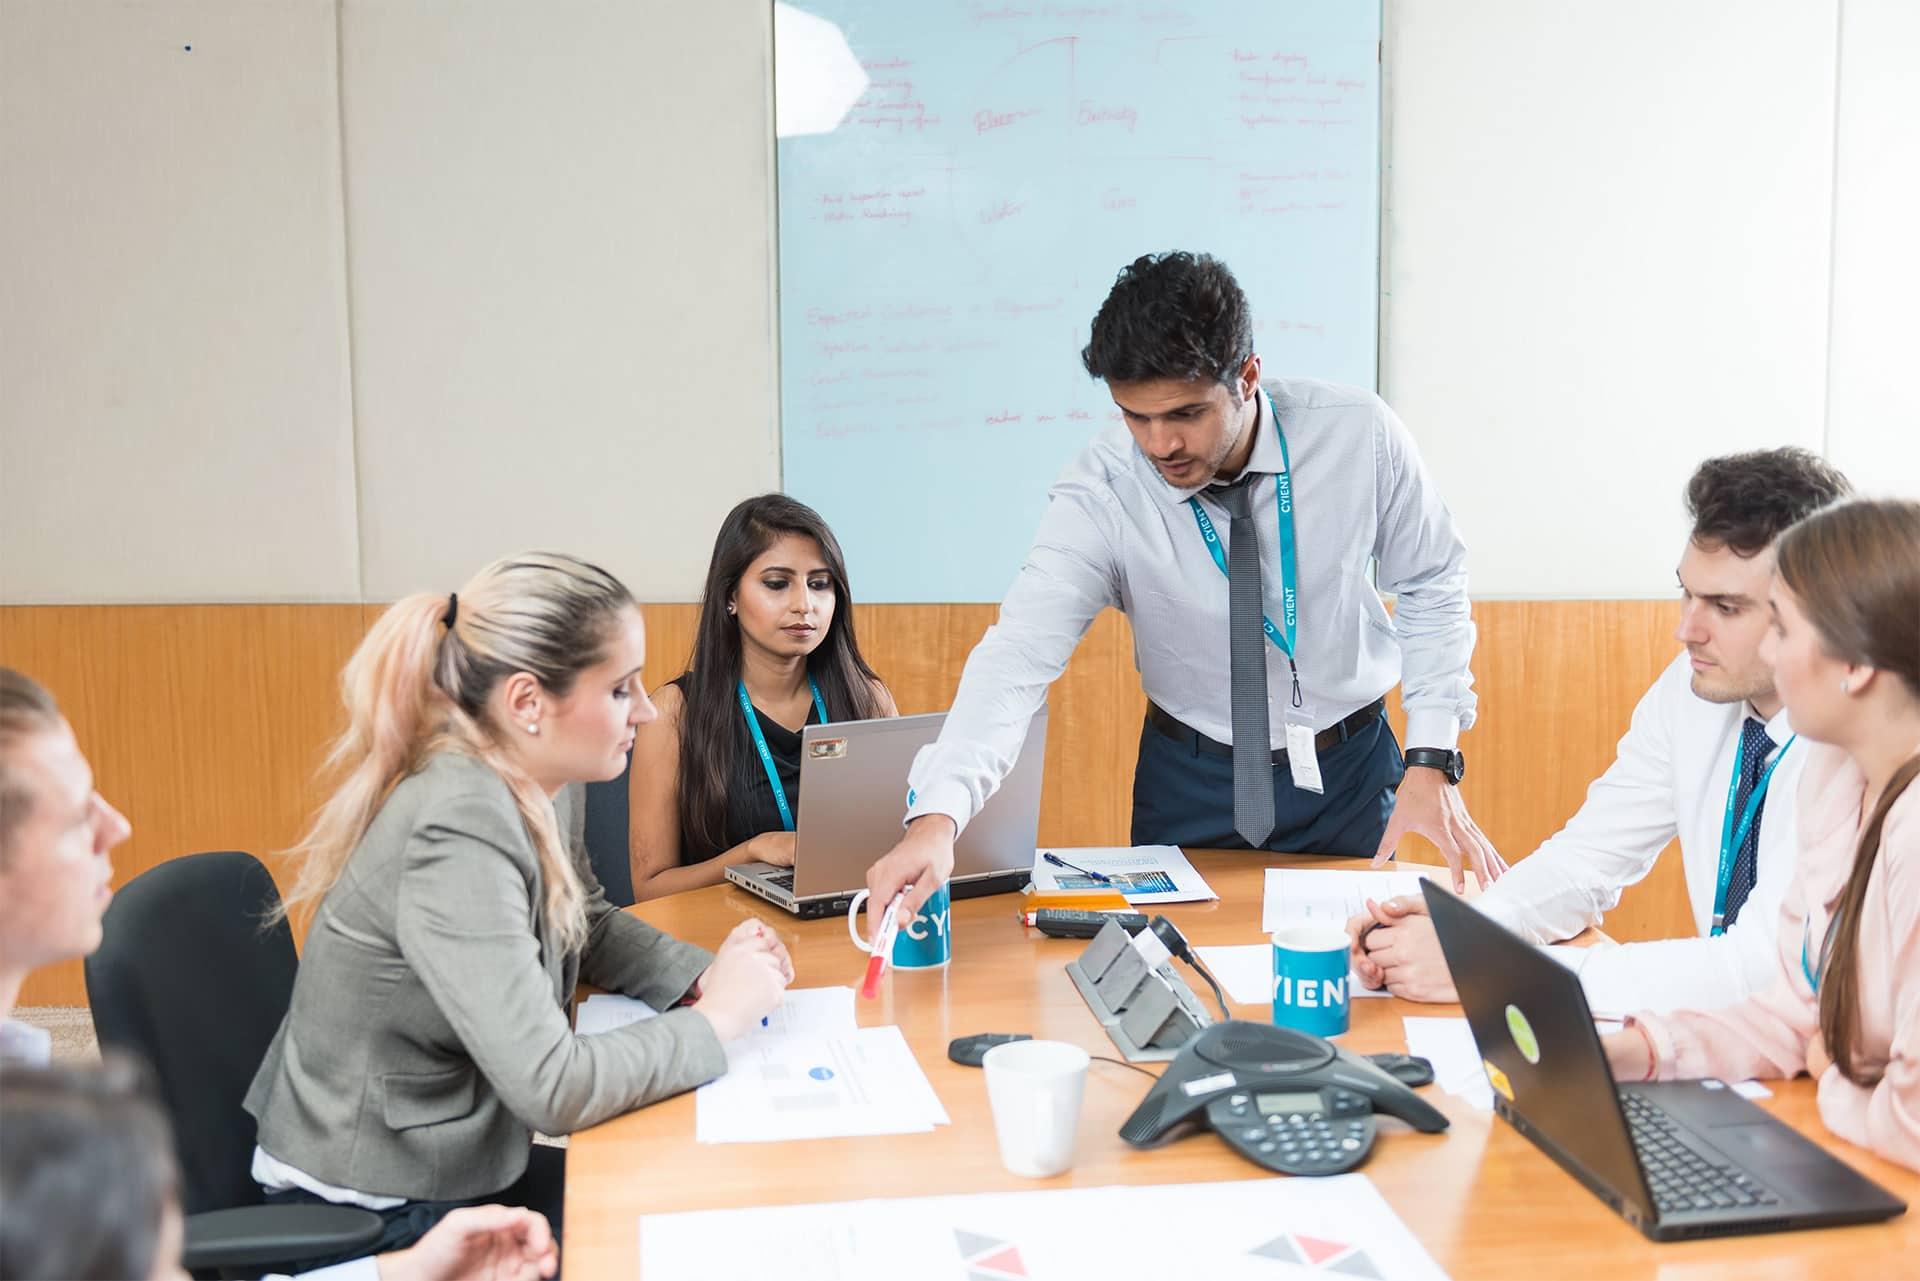 Improve Office Environment For Team Development